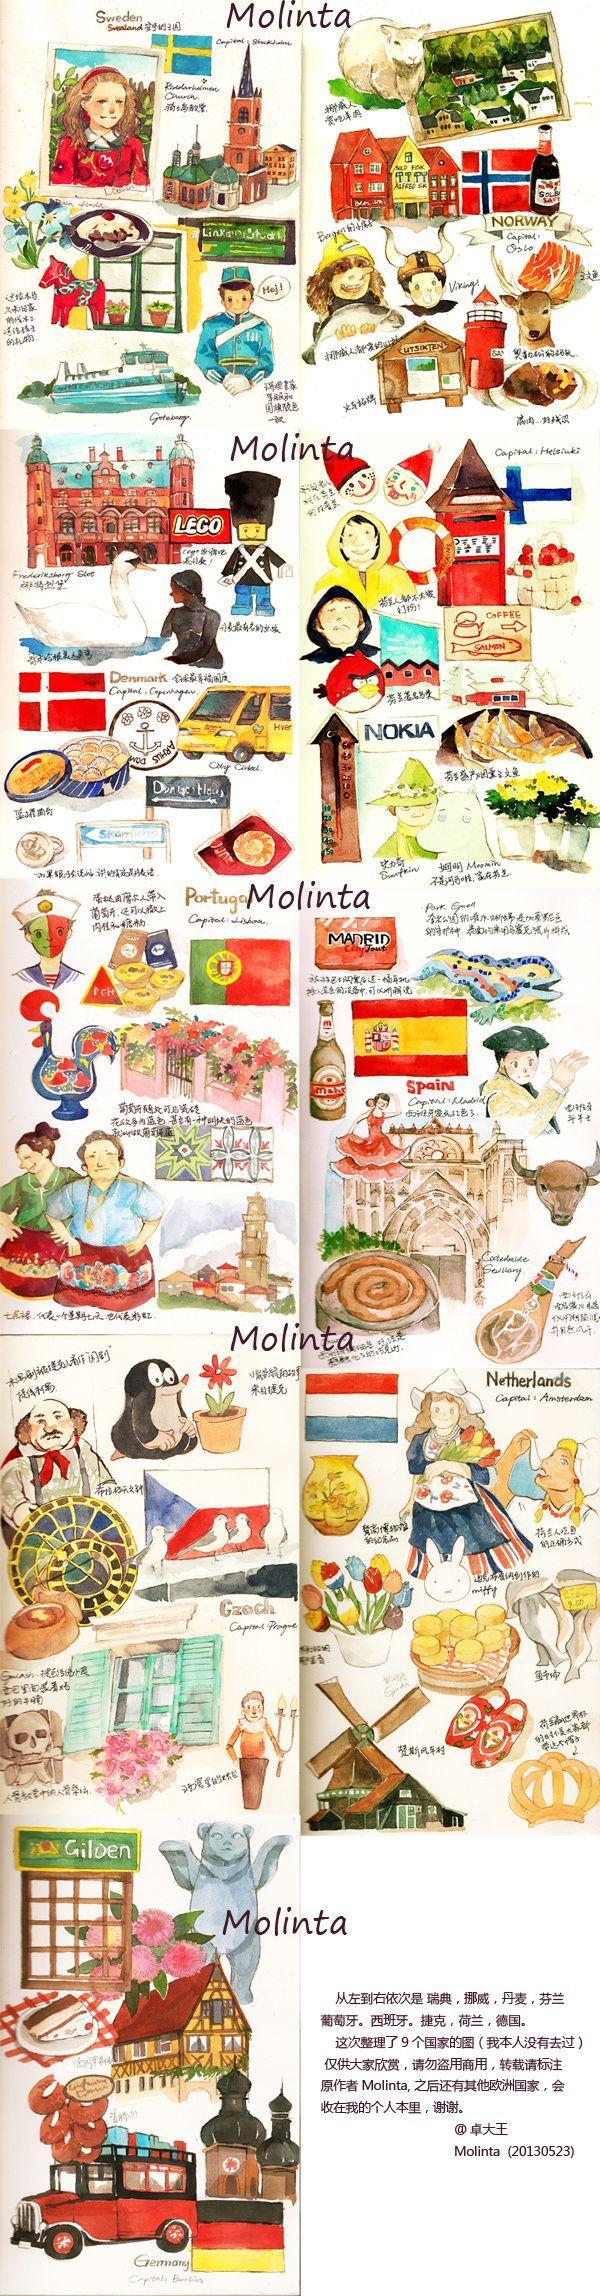 Свадьба - Molinta  的涂鸦王国作品《一些随笔涂鸦》  -  涂鸦王国插画